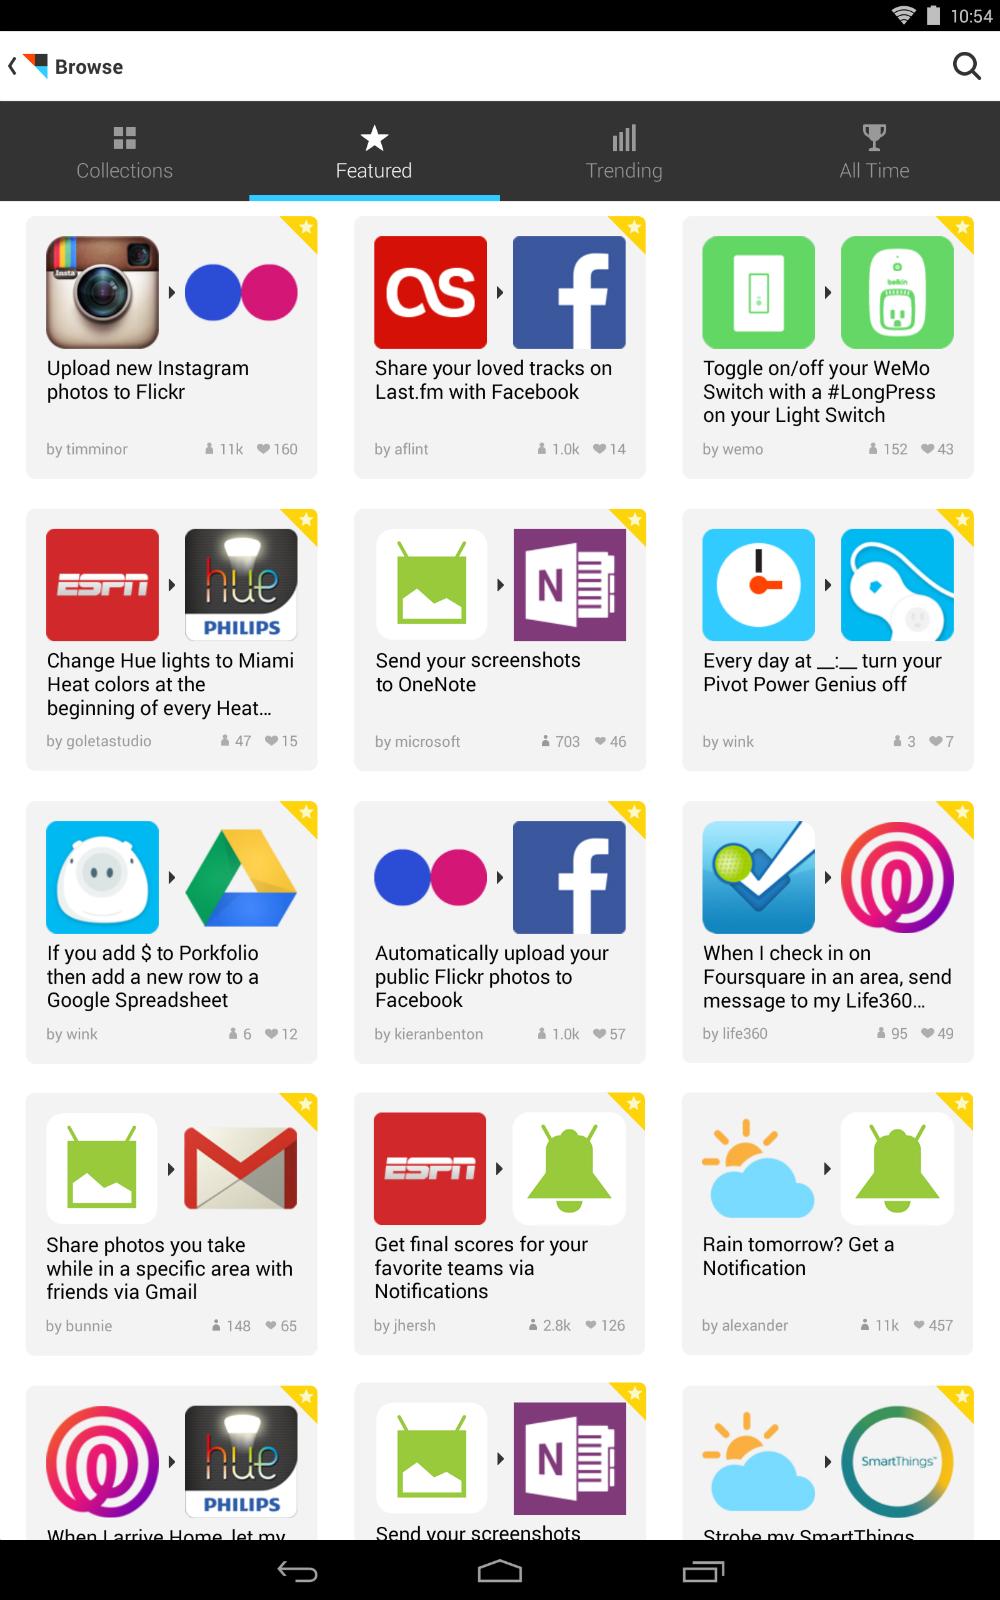 ifttt-android-app-11